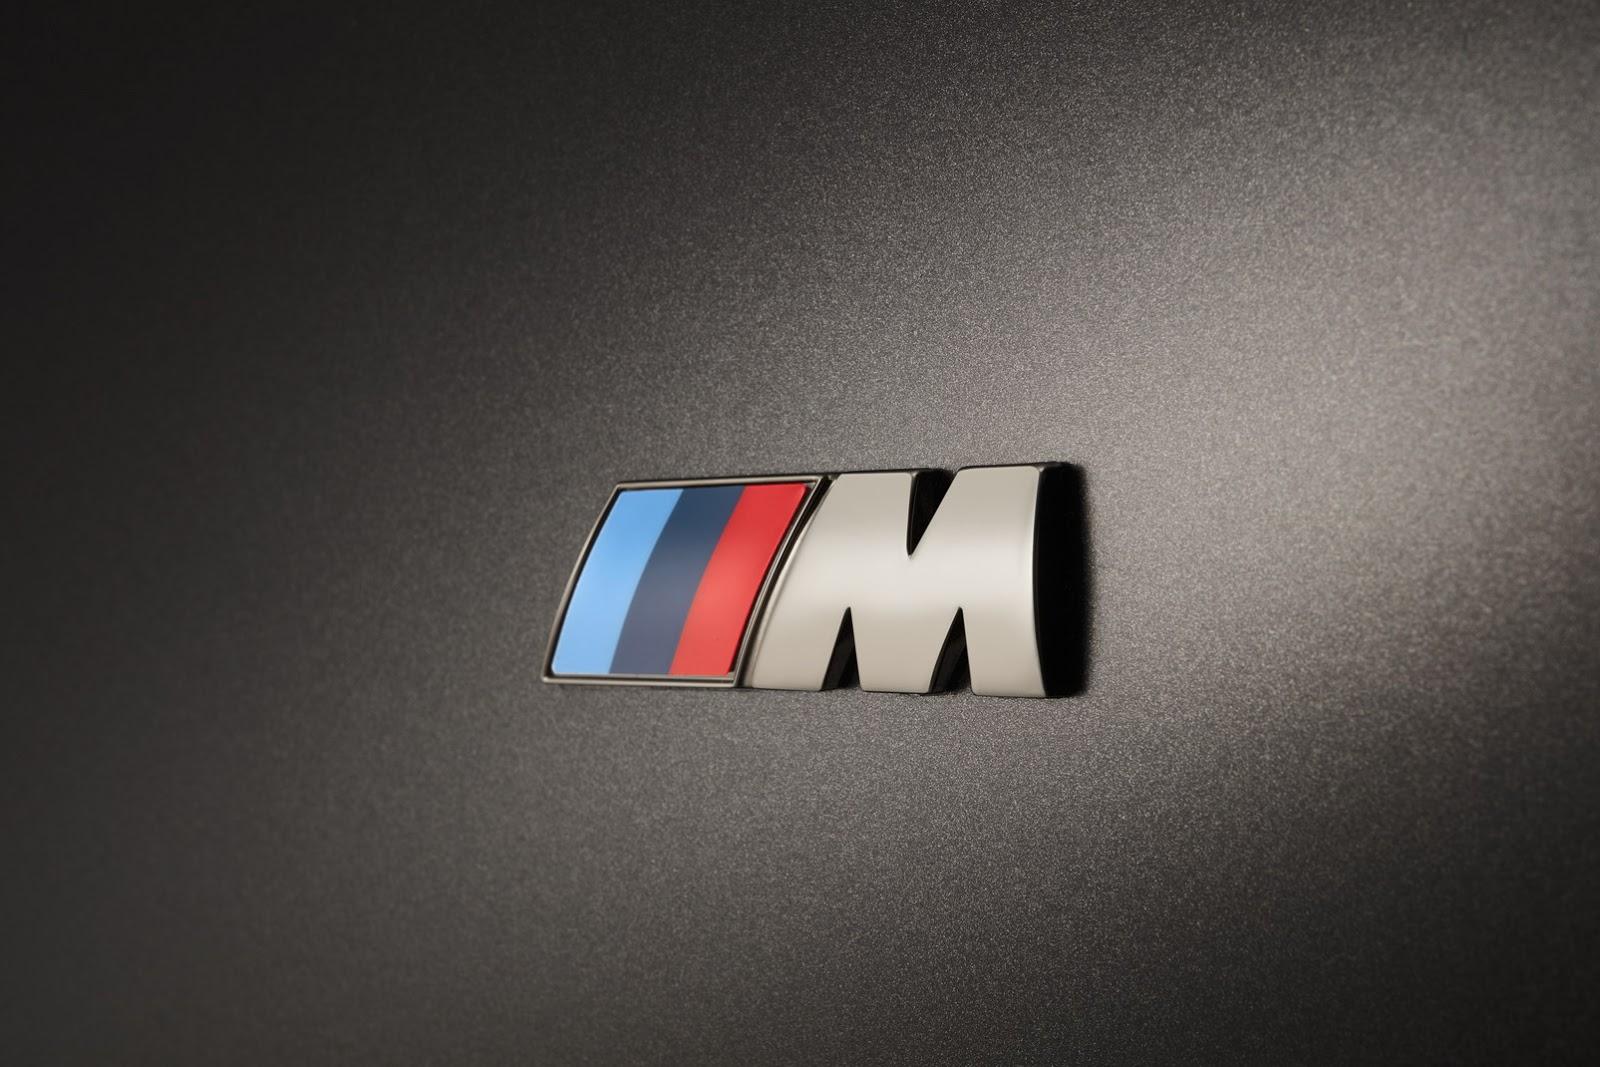 BMW-00001